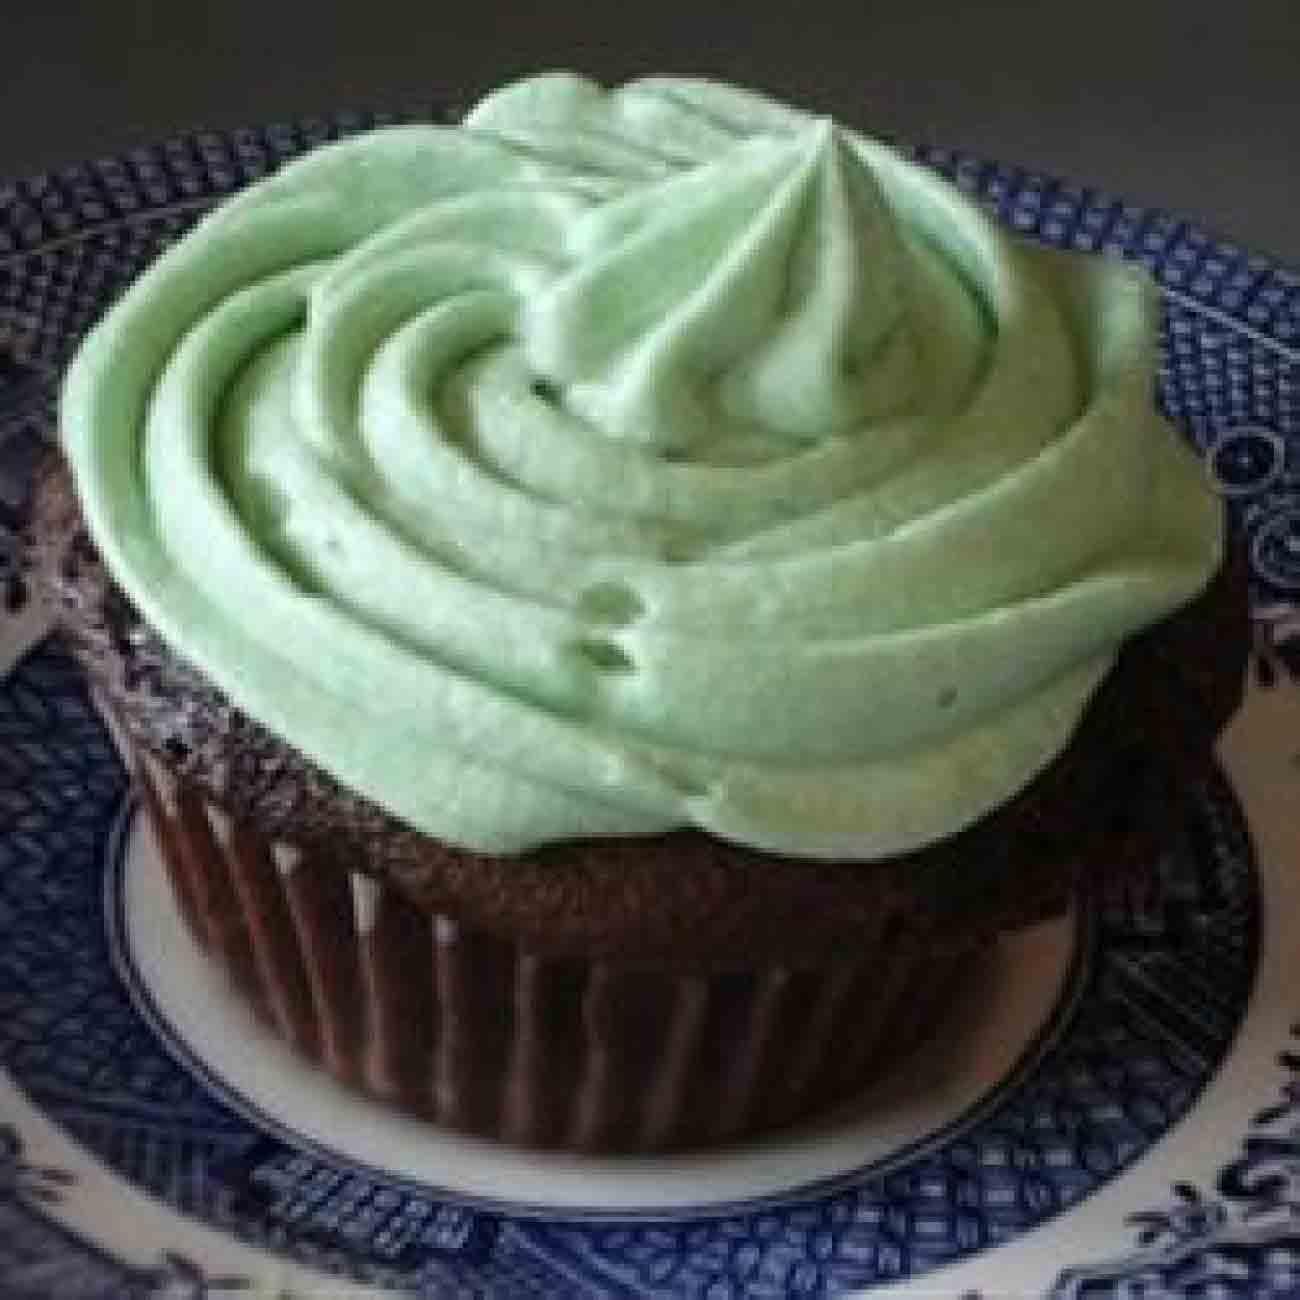 Gluten-Free Chocolate Cake with Semi-Sweet Chocolate Icing Recipe